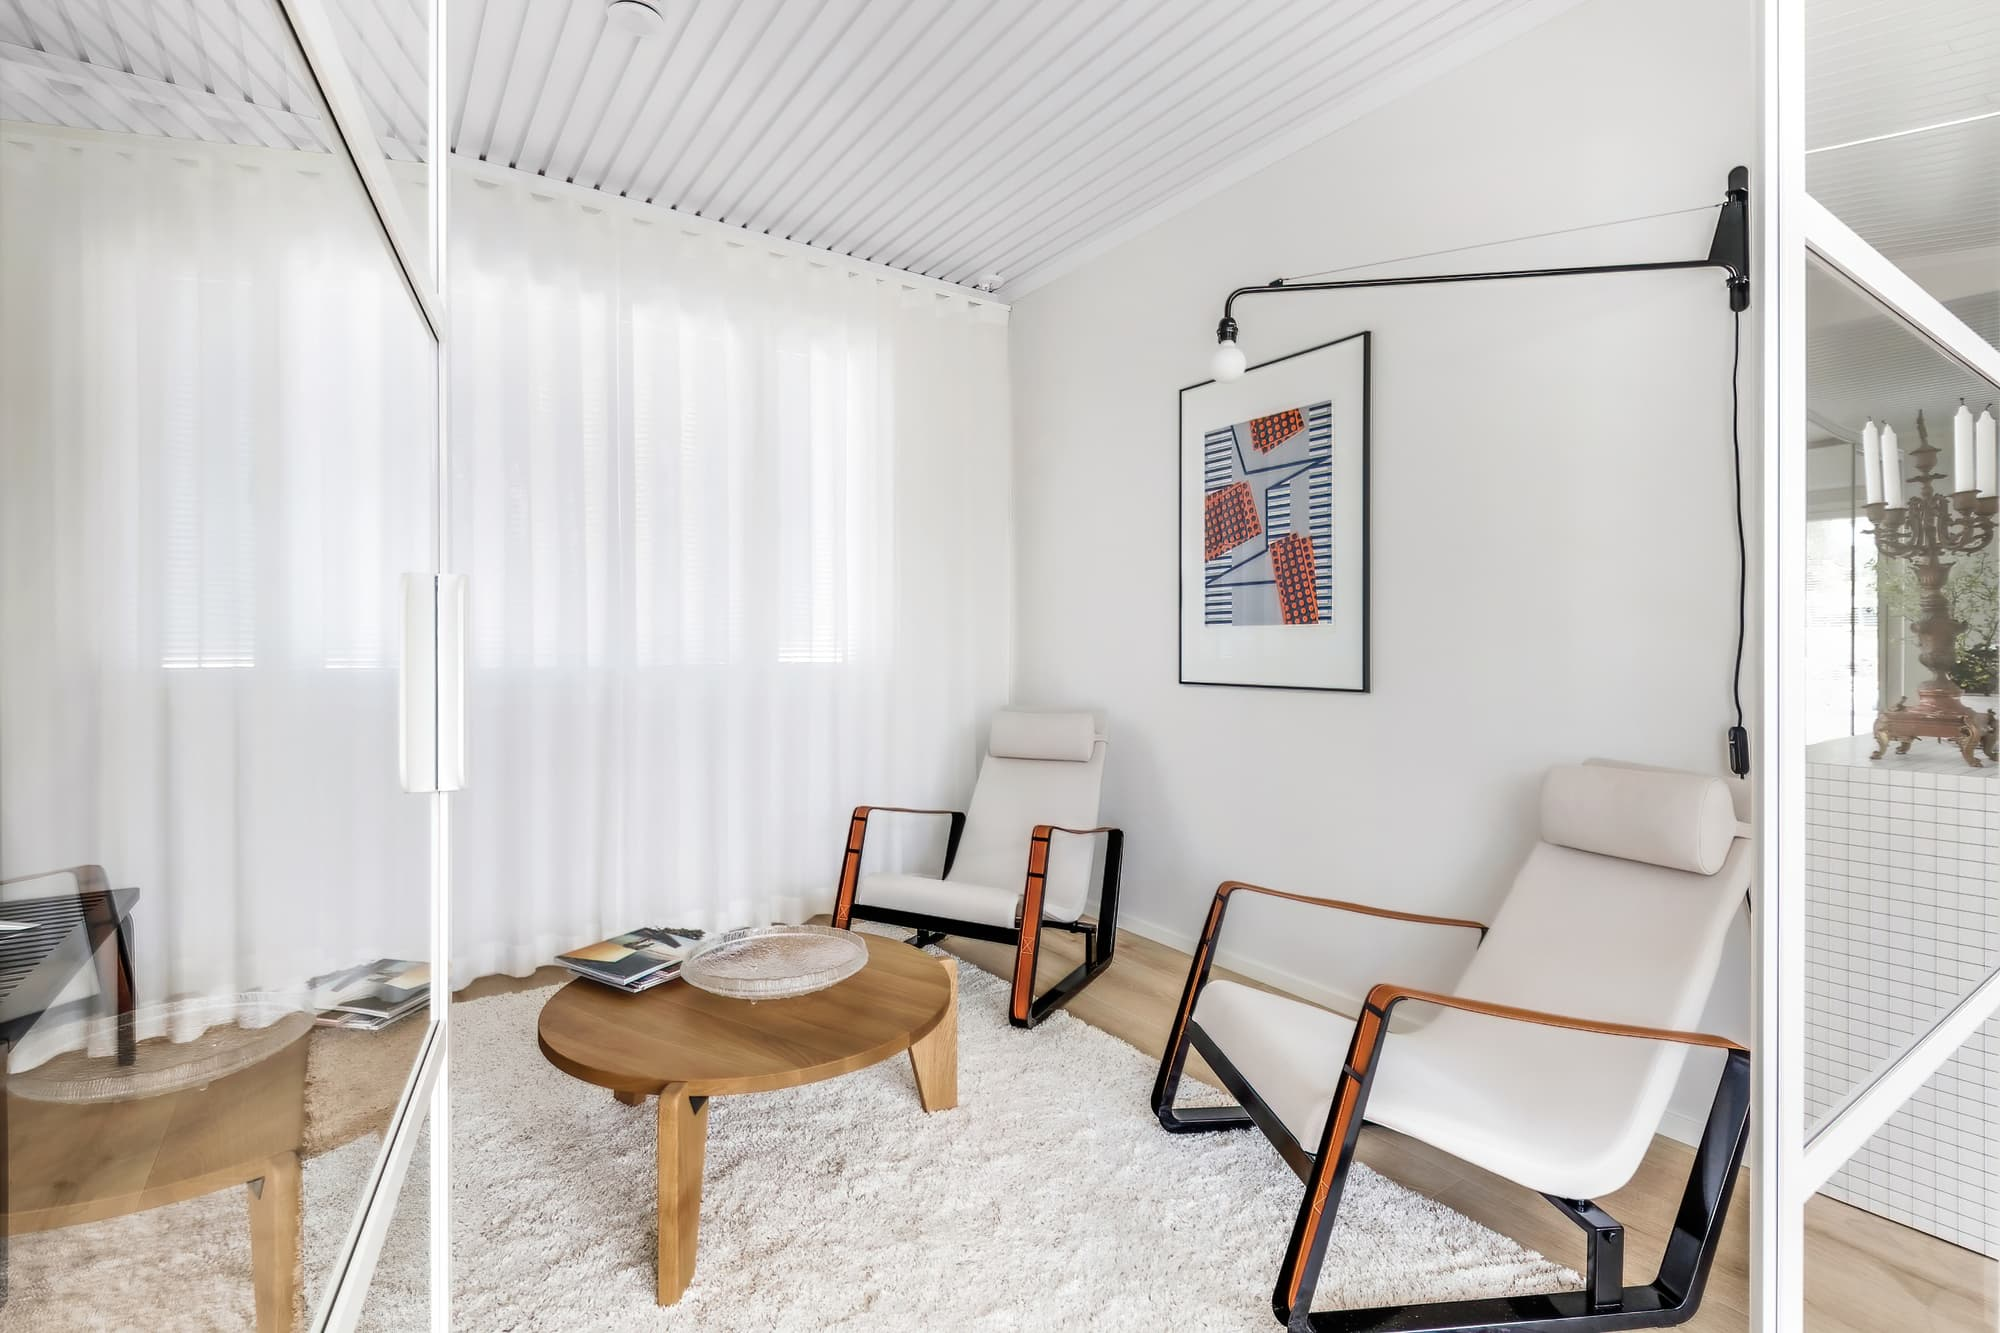 kannustalon-suomi-messutalo-2021-tv-huone